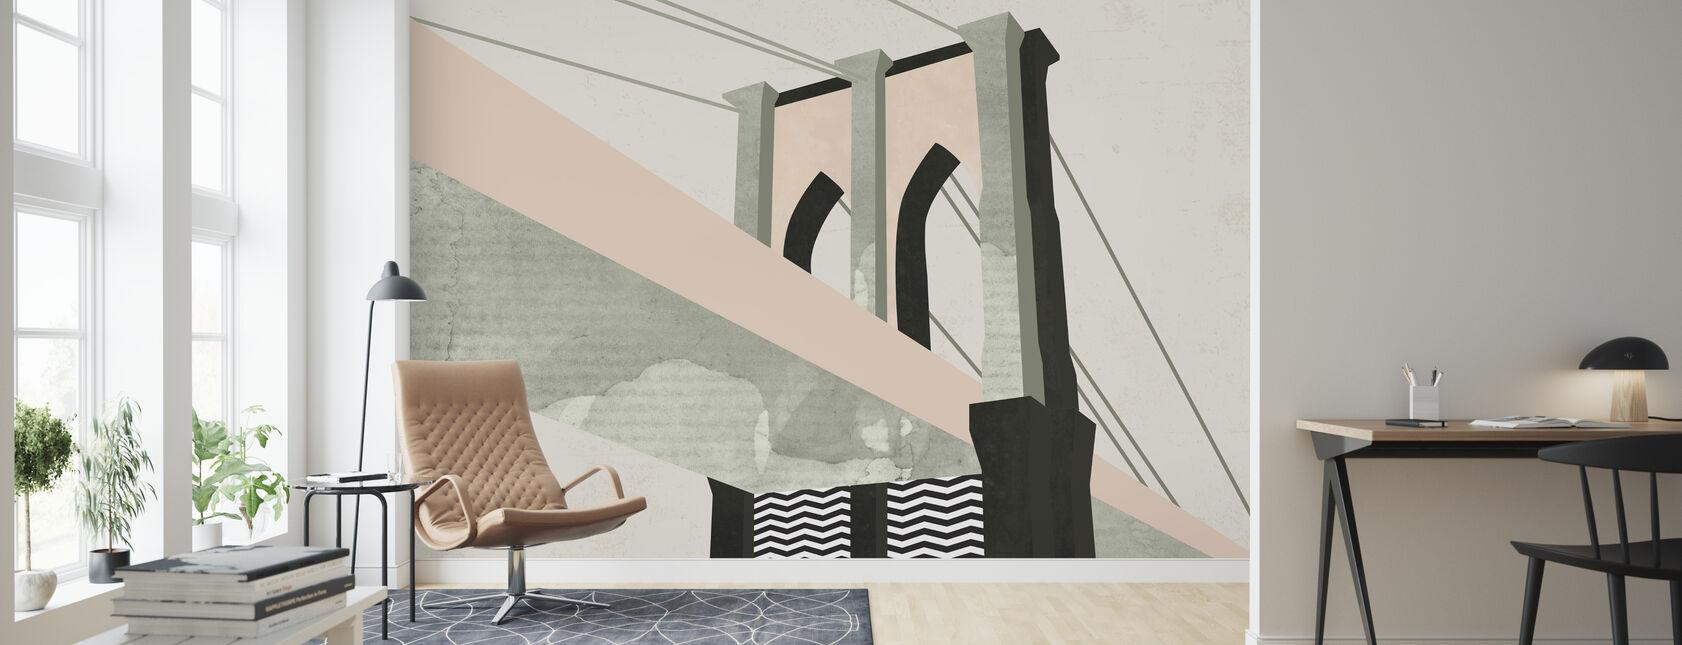 Graphic New York - Wallpaper - Living Room